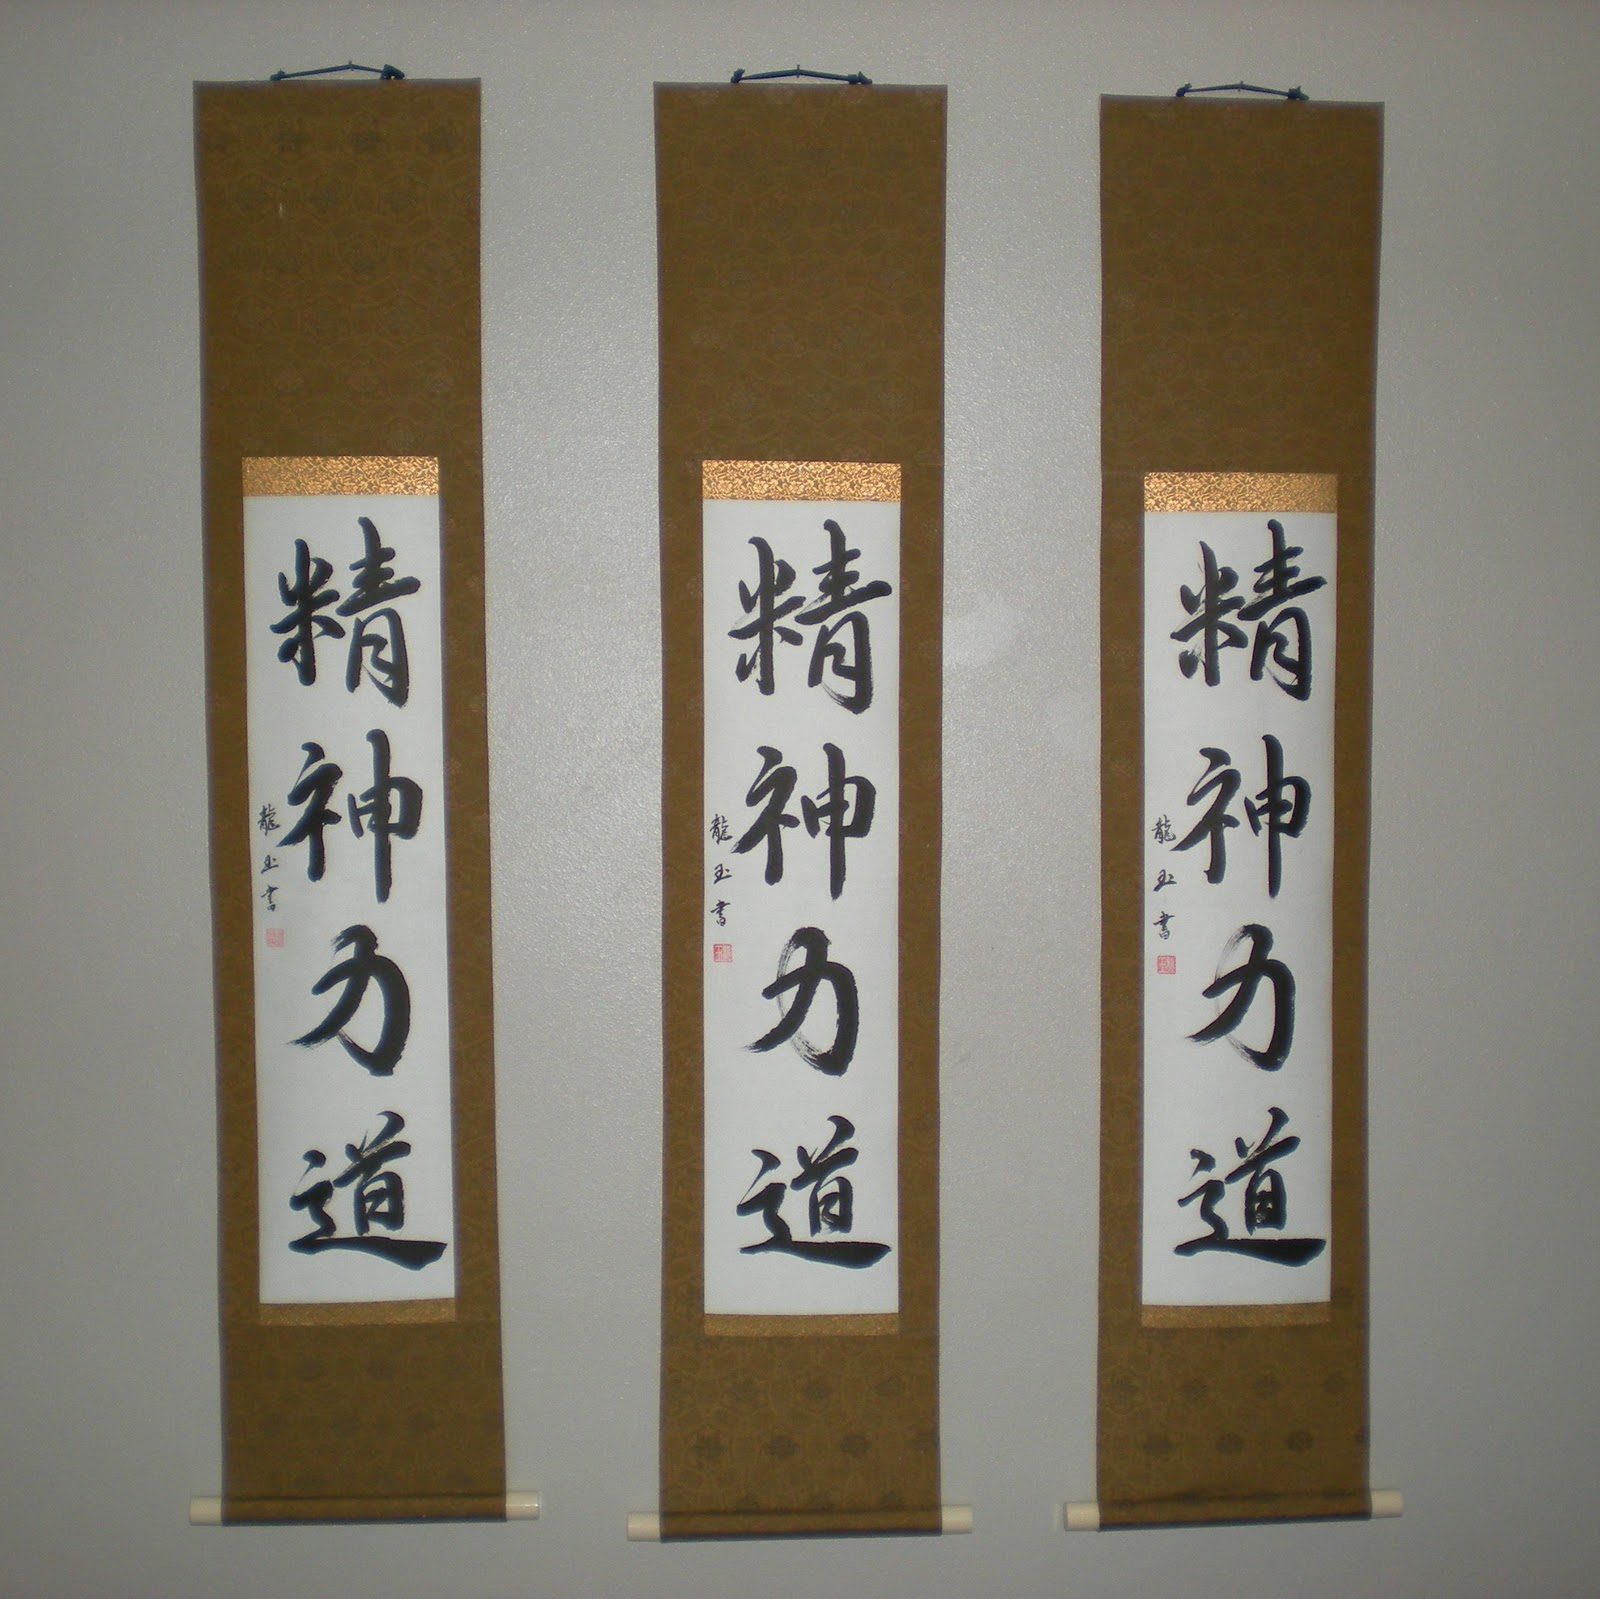 Wall scroll or kakejiku december 2011 kakejiku the way of inner strength biocorpaavc